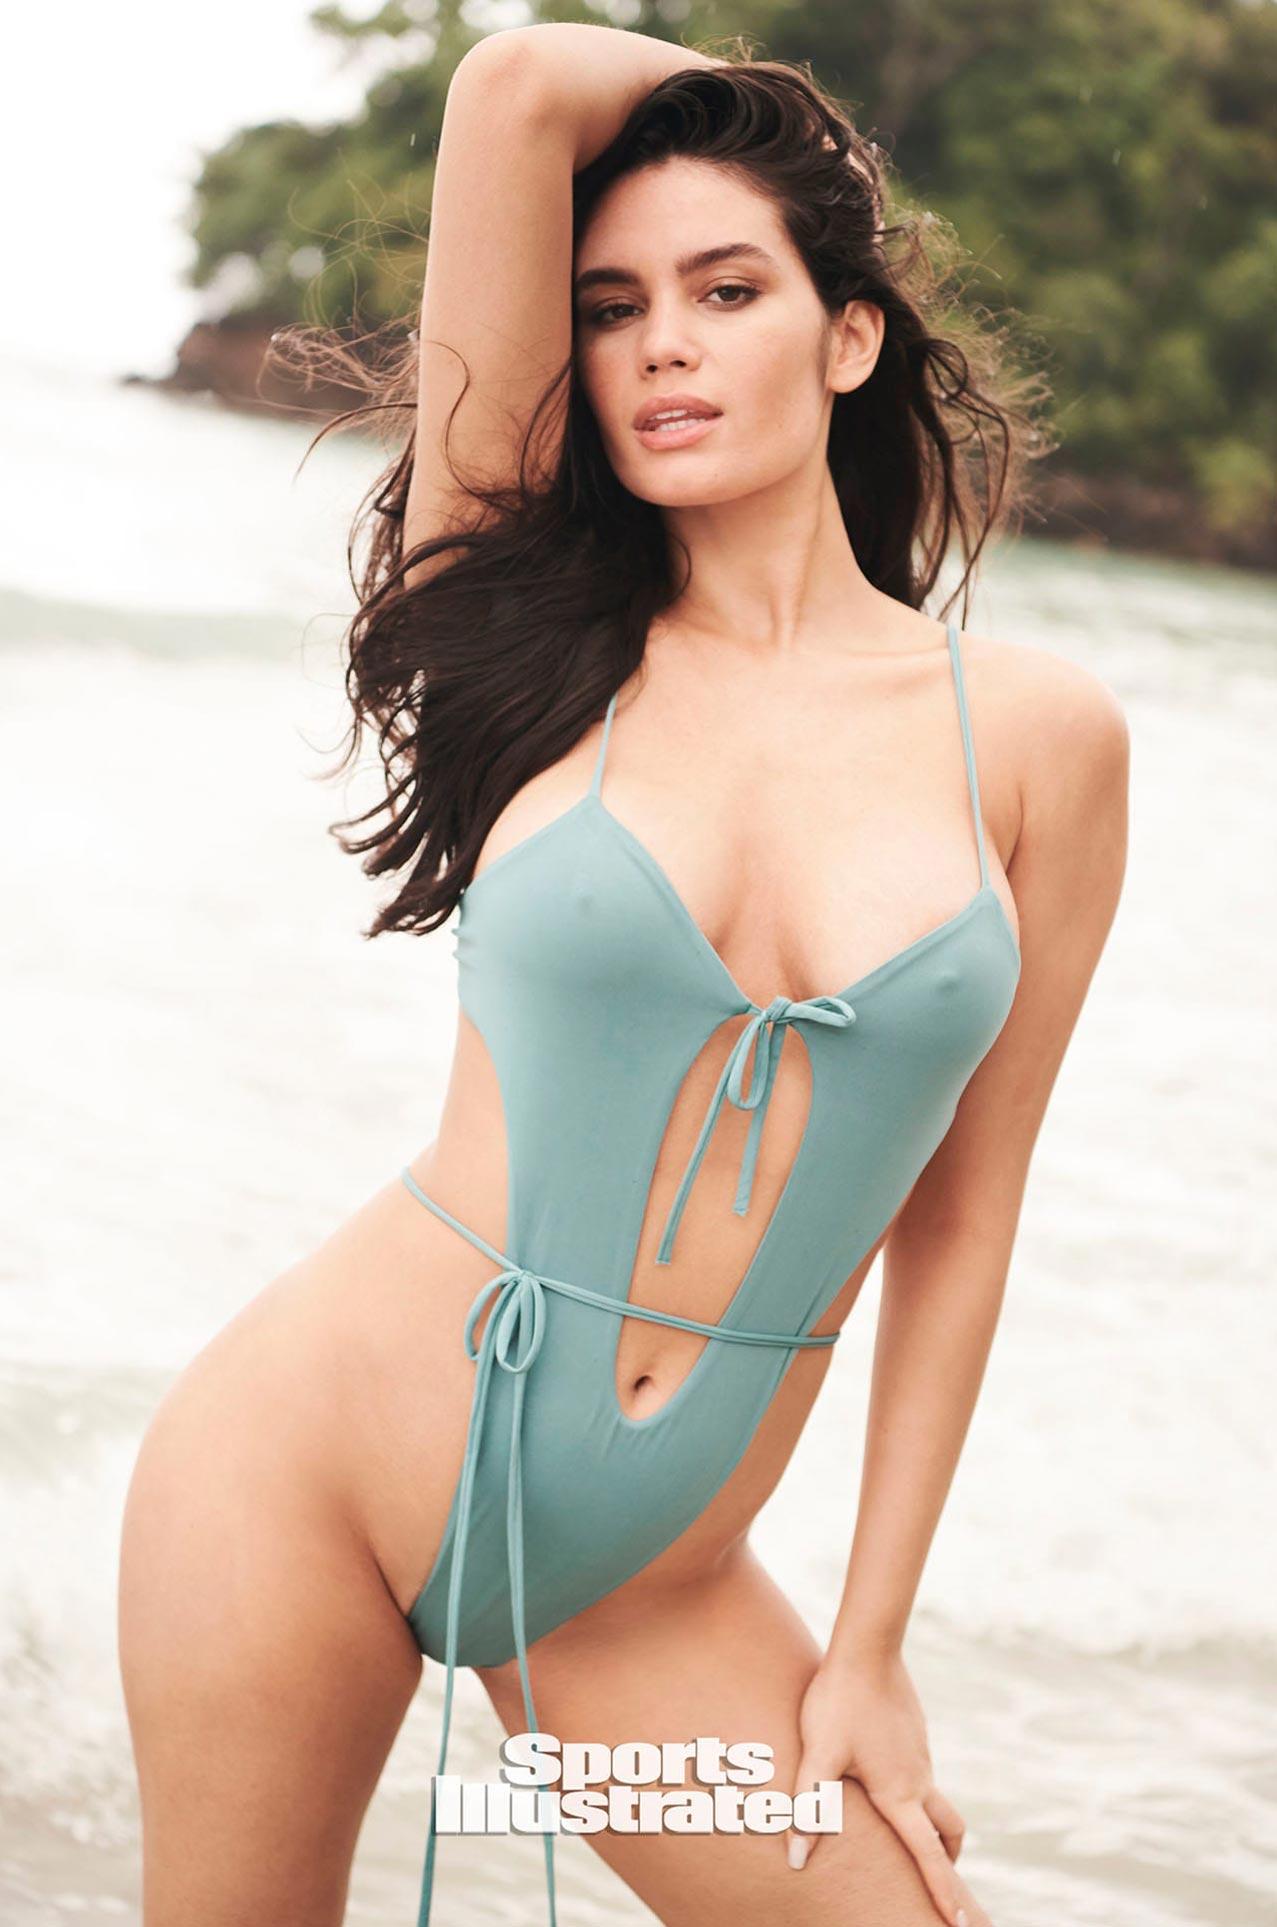 Энн де Паула в каталоге купальников Sports Illustrated Swimsuit 2020 / фото 05